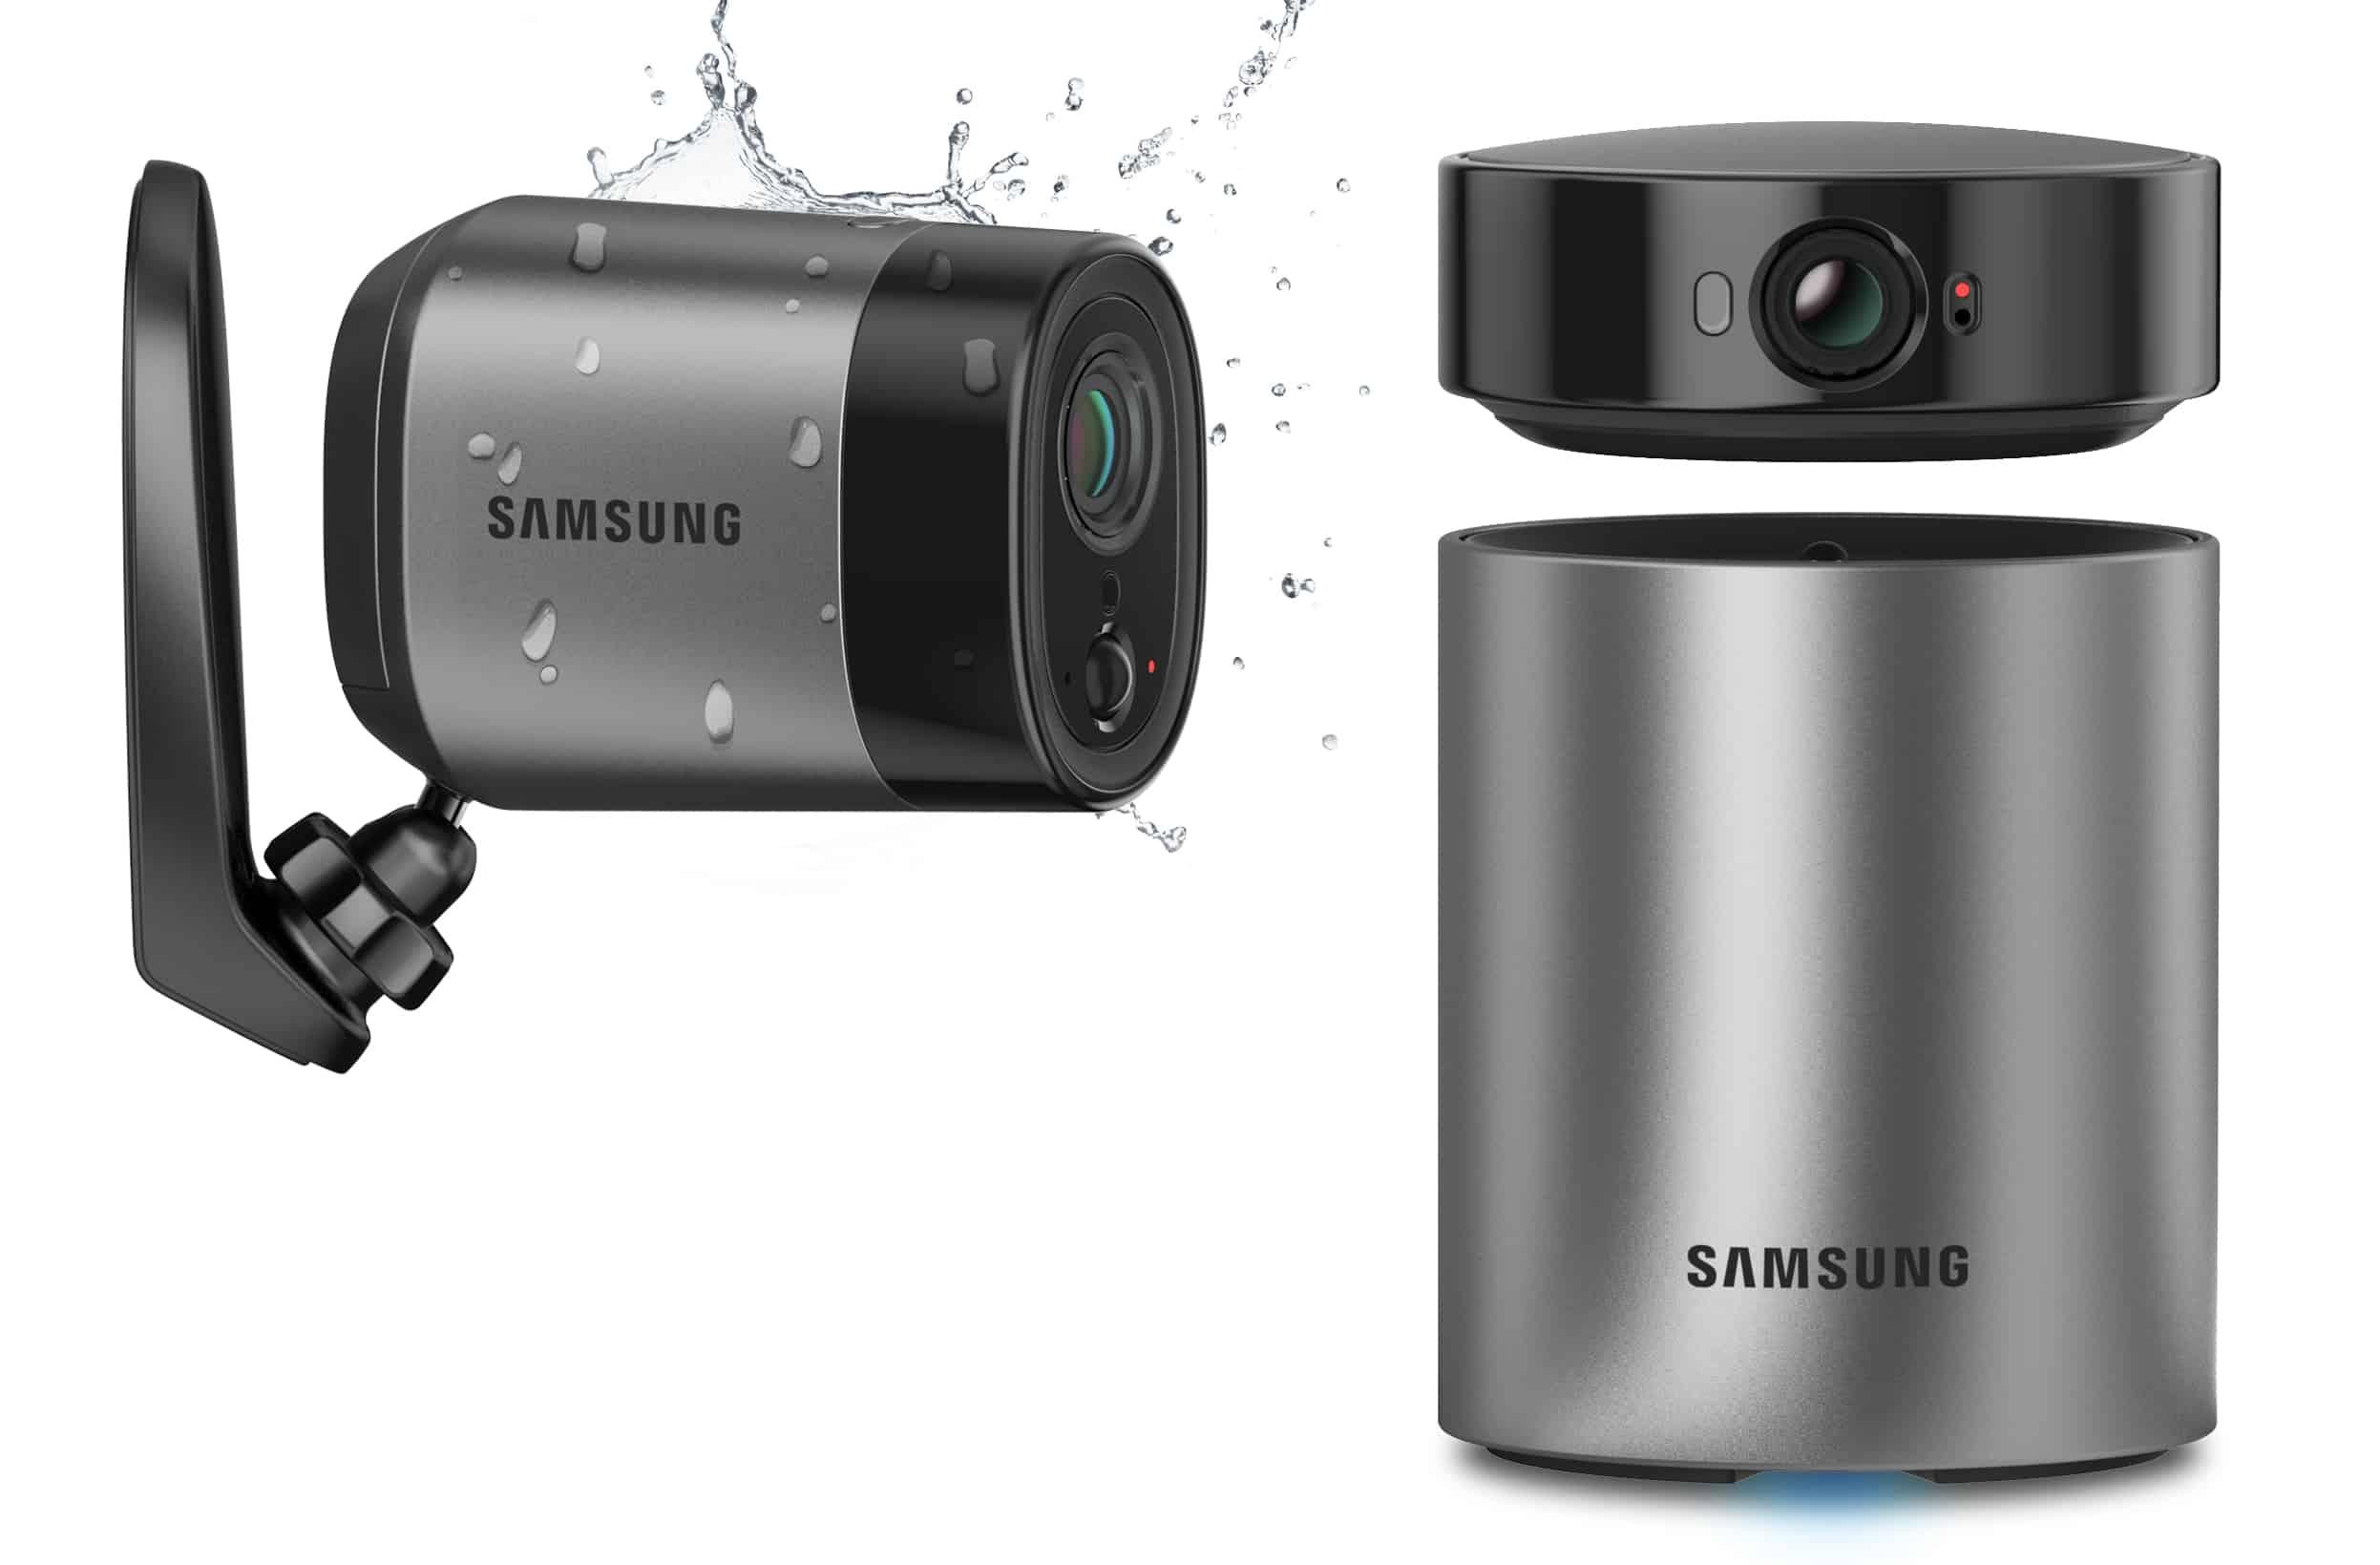 Samsung Security Camera | Samsung Surveillance Camera Systems